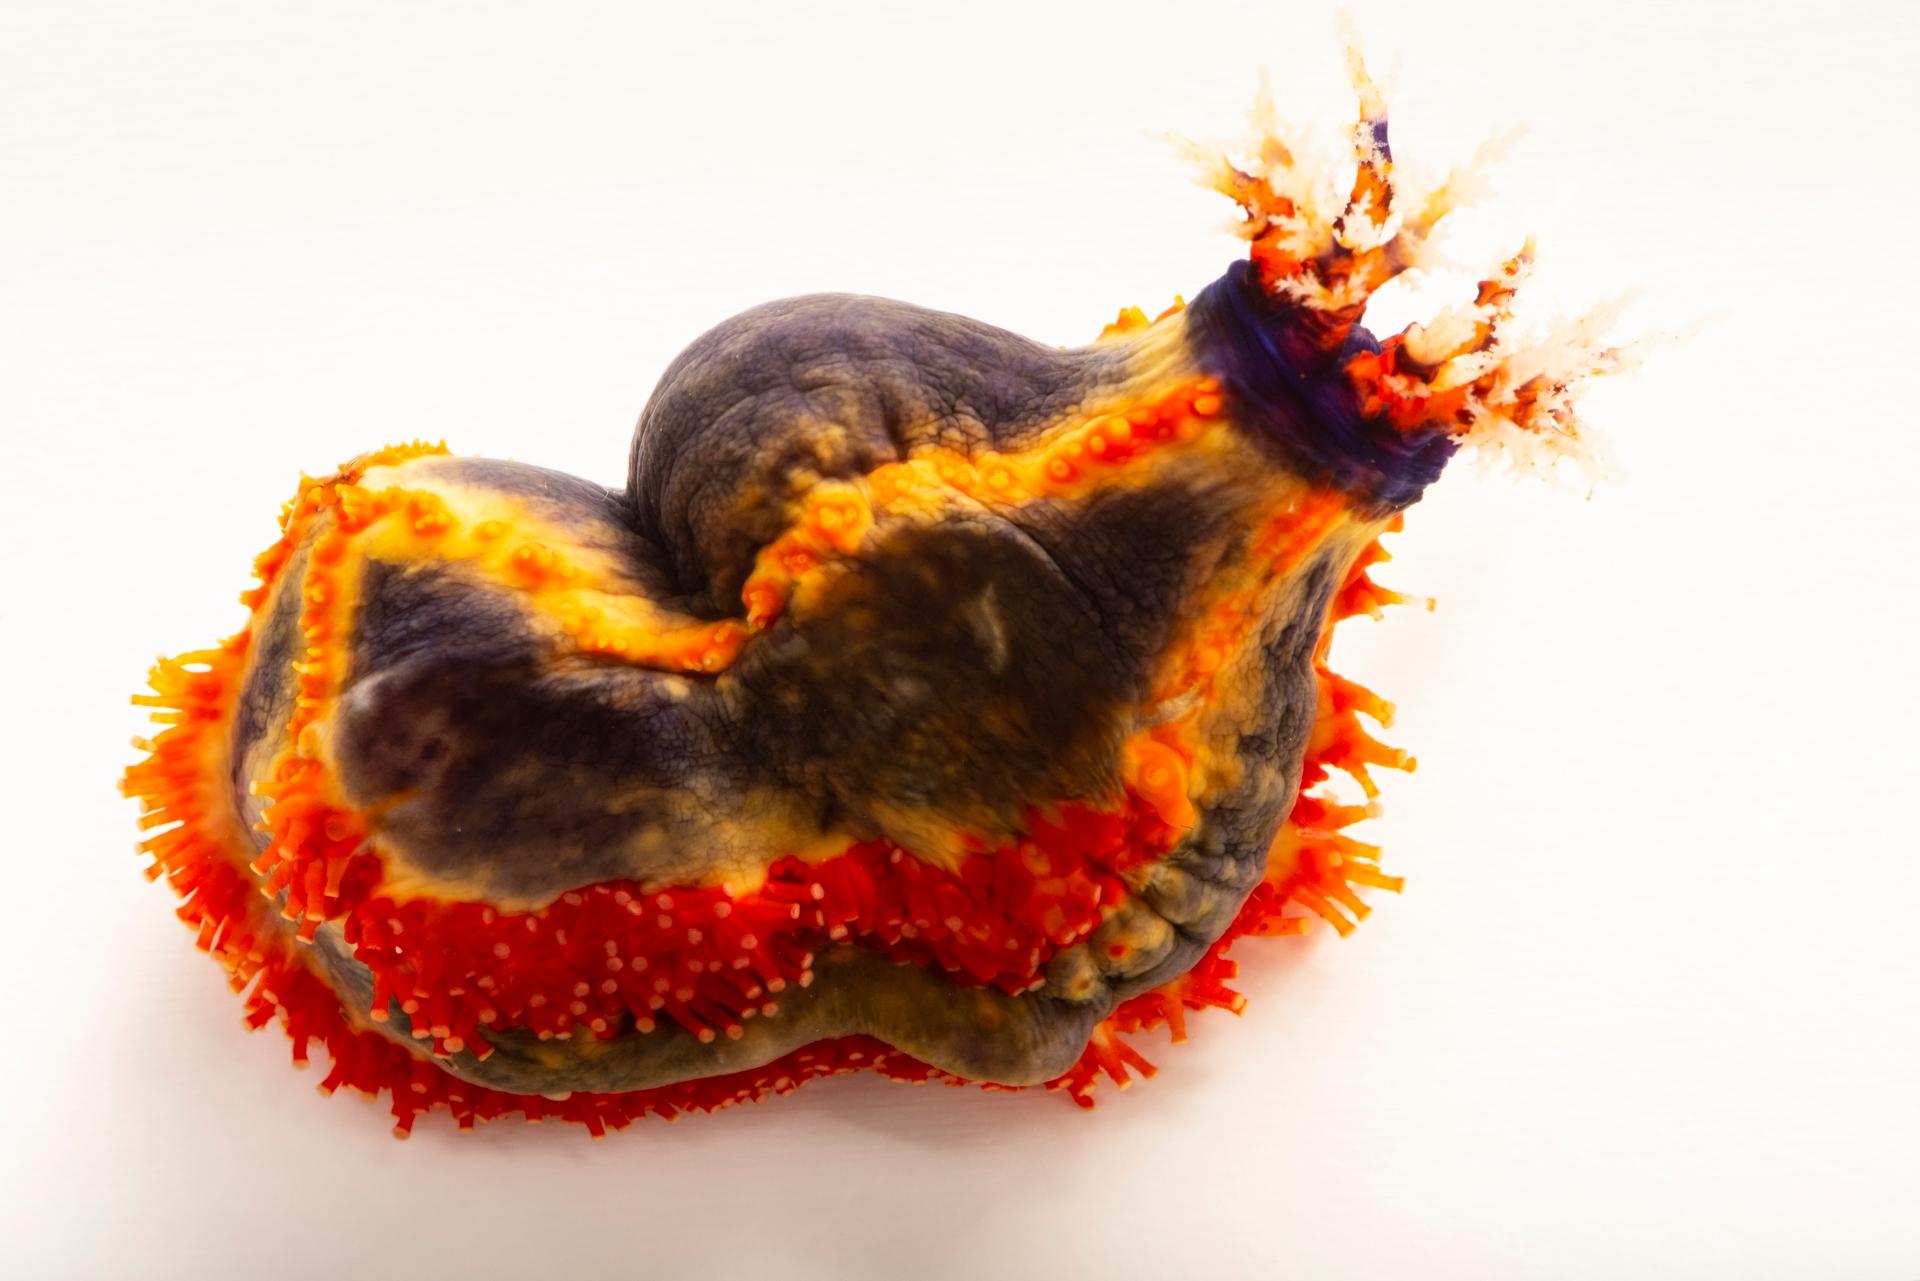 Photo: An Australian sea apple (Pseudocolochirus axiologus) at the Dallas World Aquarium.